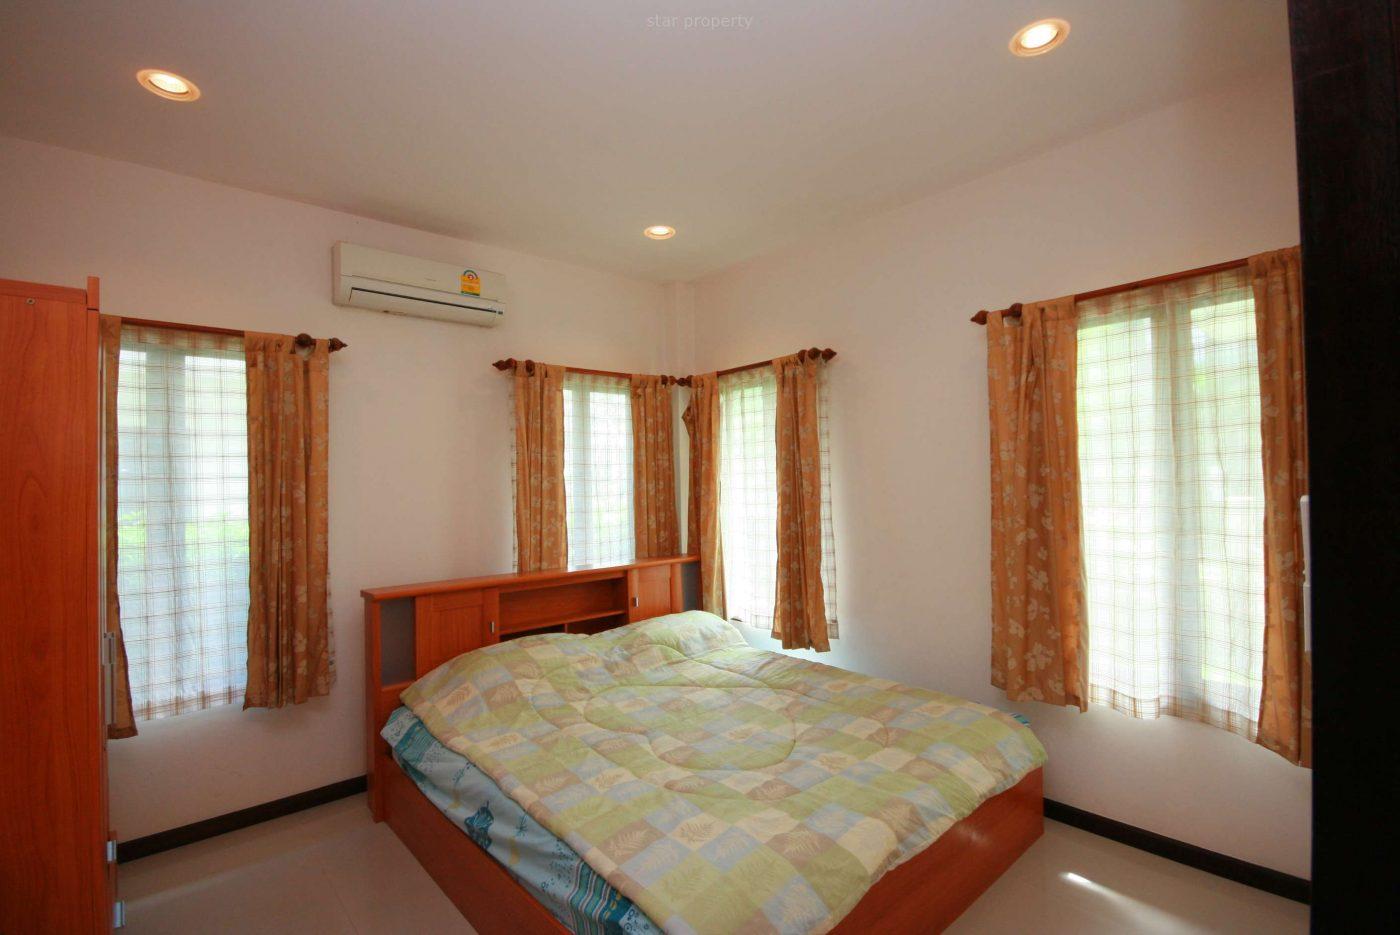 2 bedroom Villa near town for rent